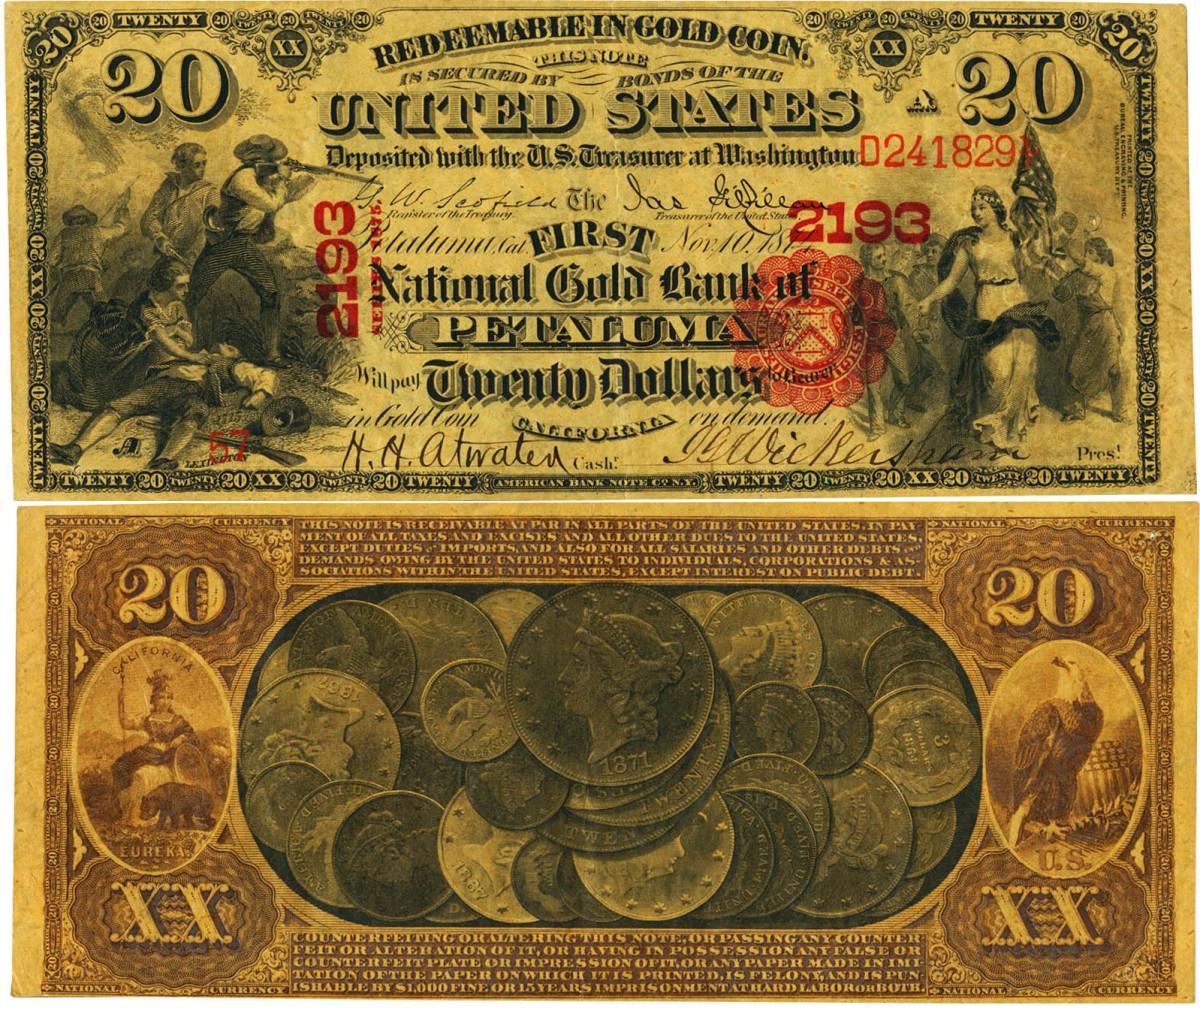 $20 1875 National Gold Bank Note from Petaluma, CA.